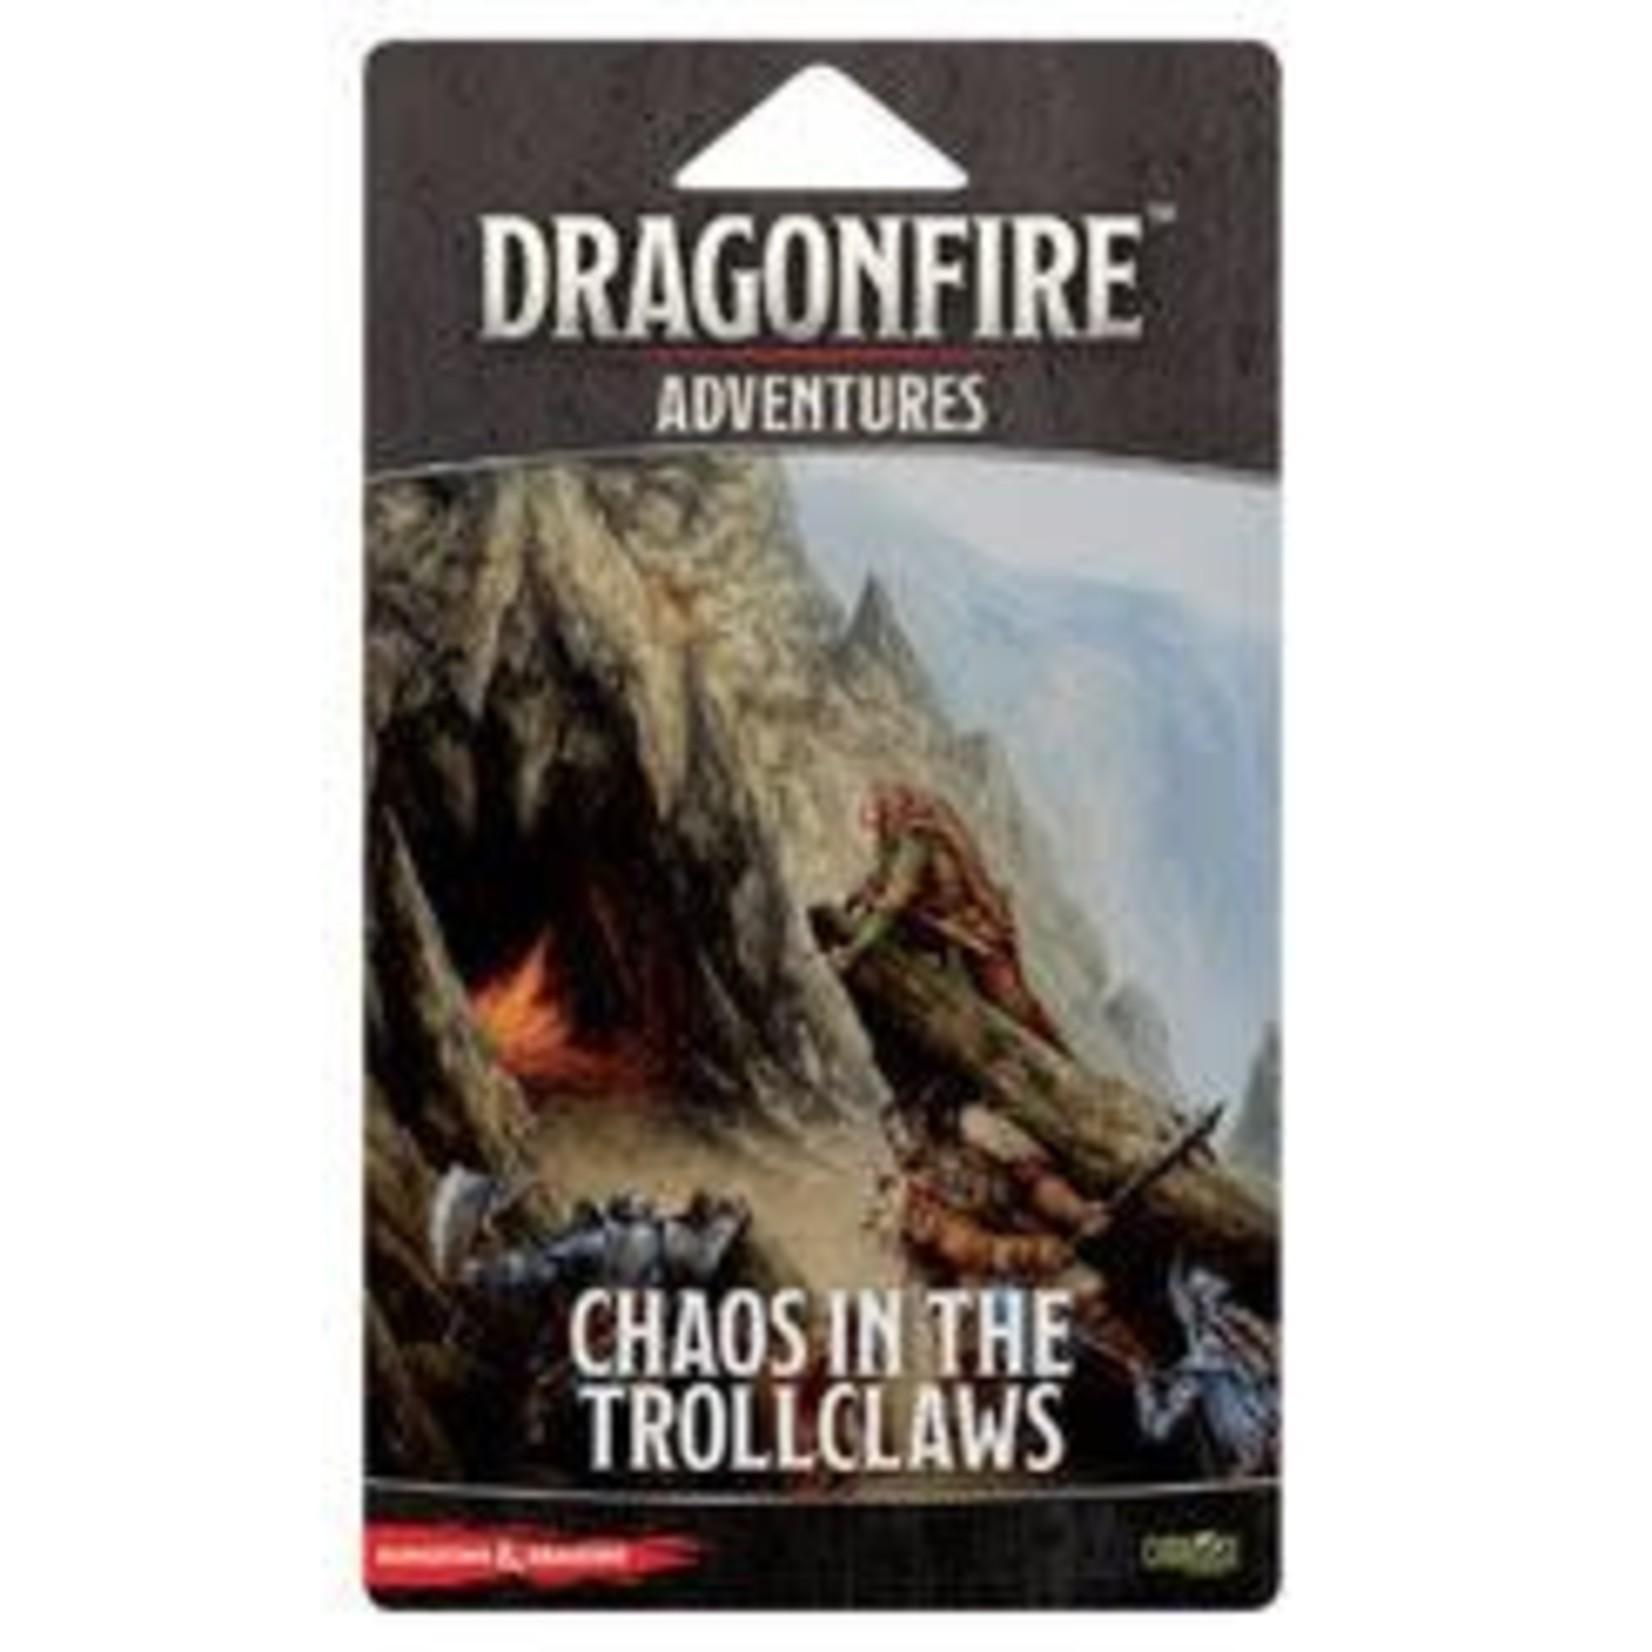 Dragonfire DBG Adventure: Chaos in the Trollclaws